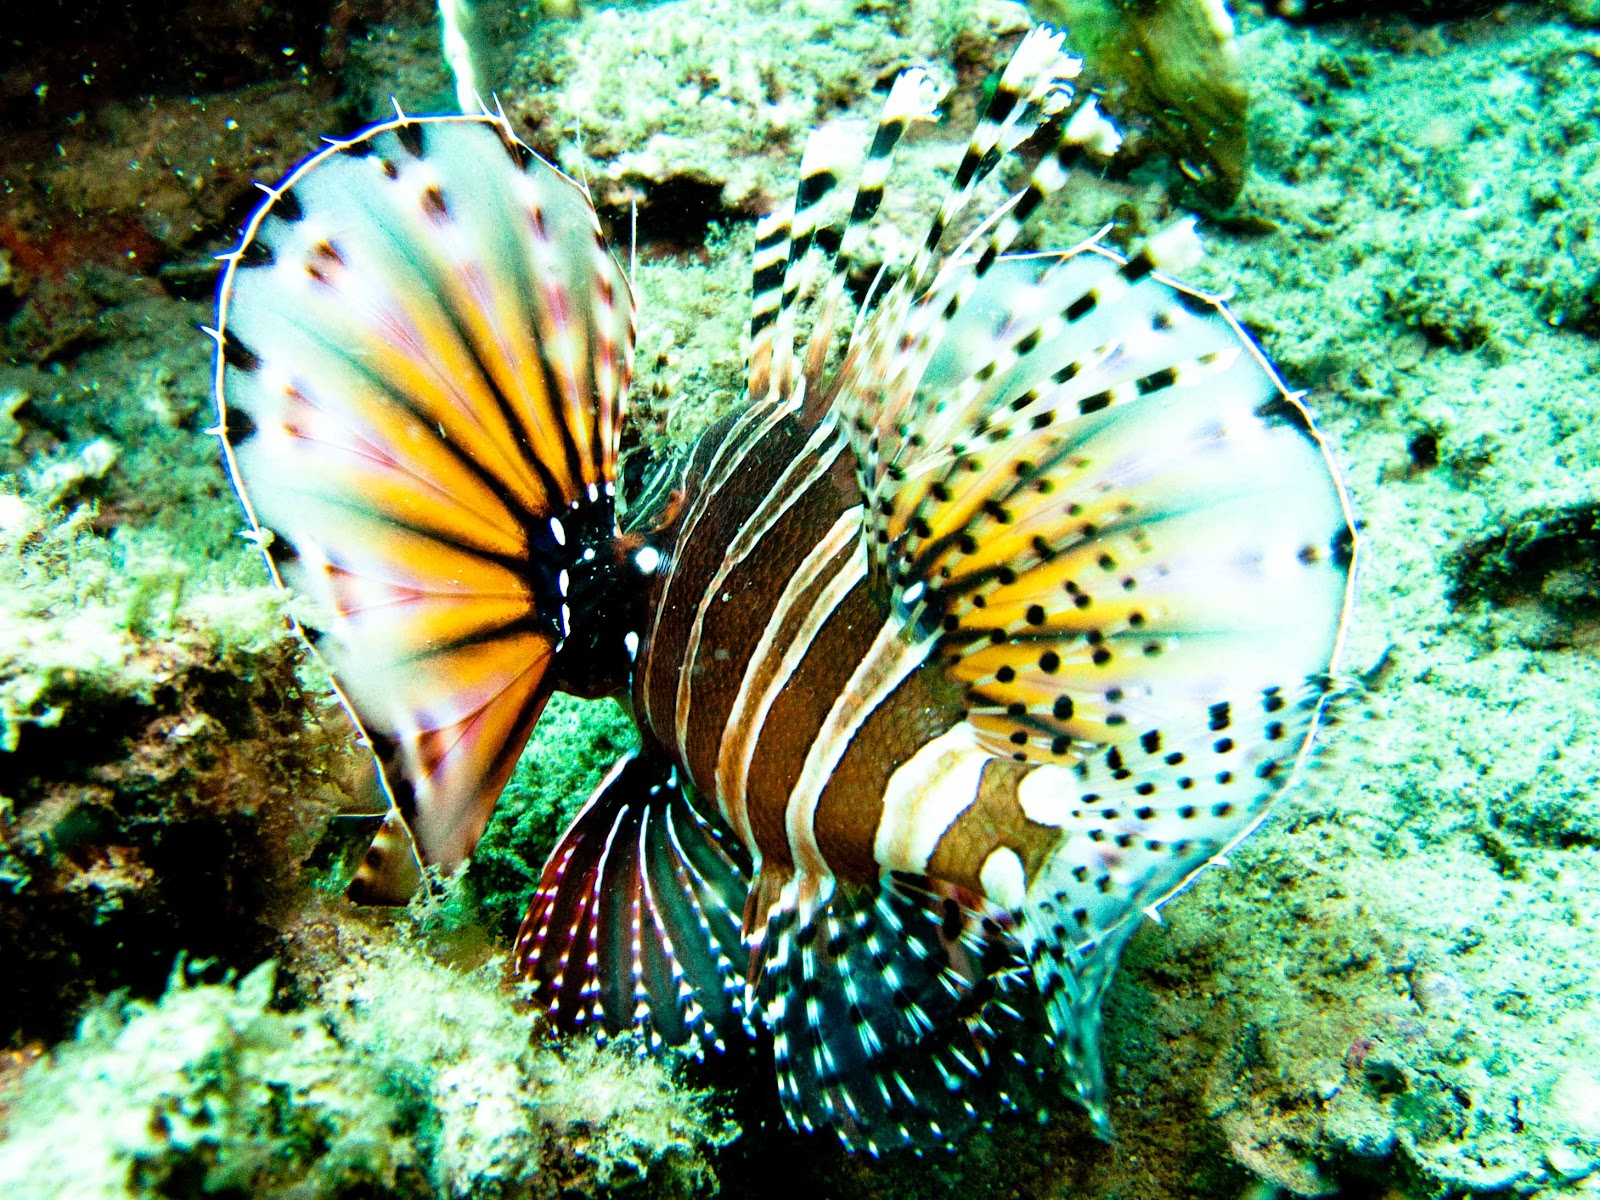 Lionfish caught when doing scuba diving in Nha Trang